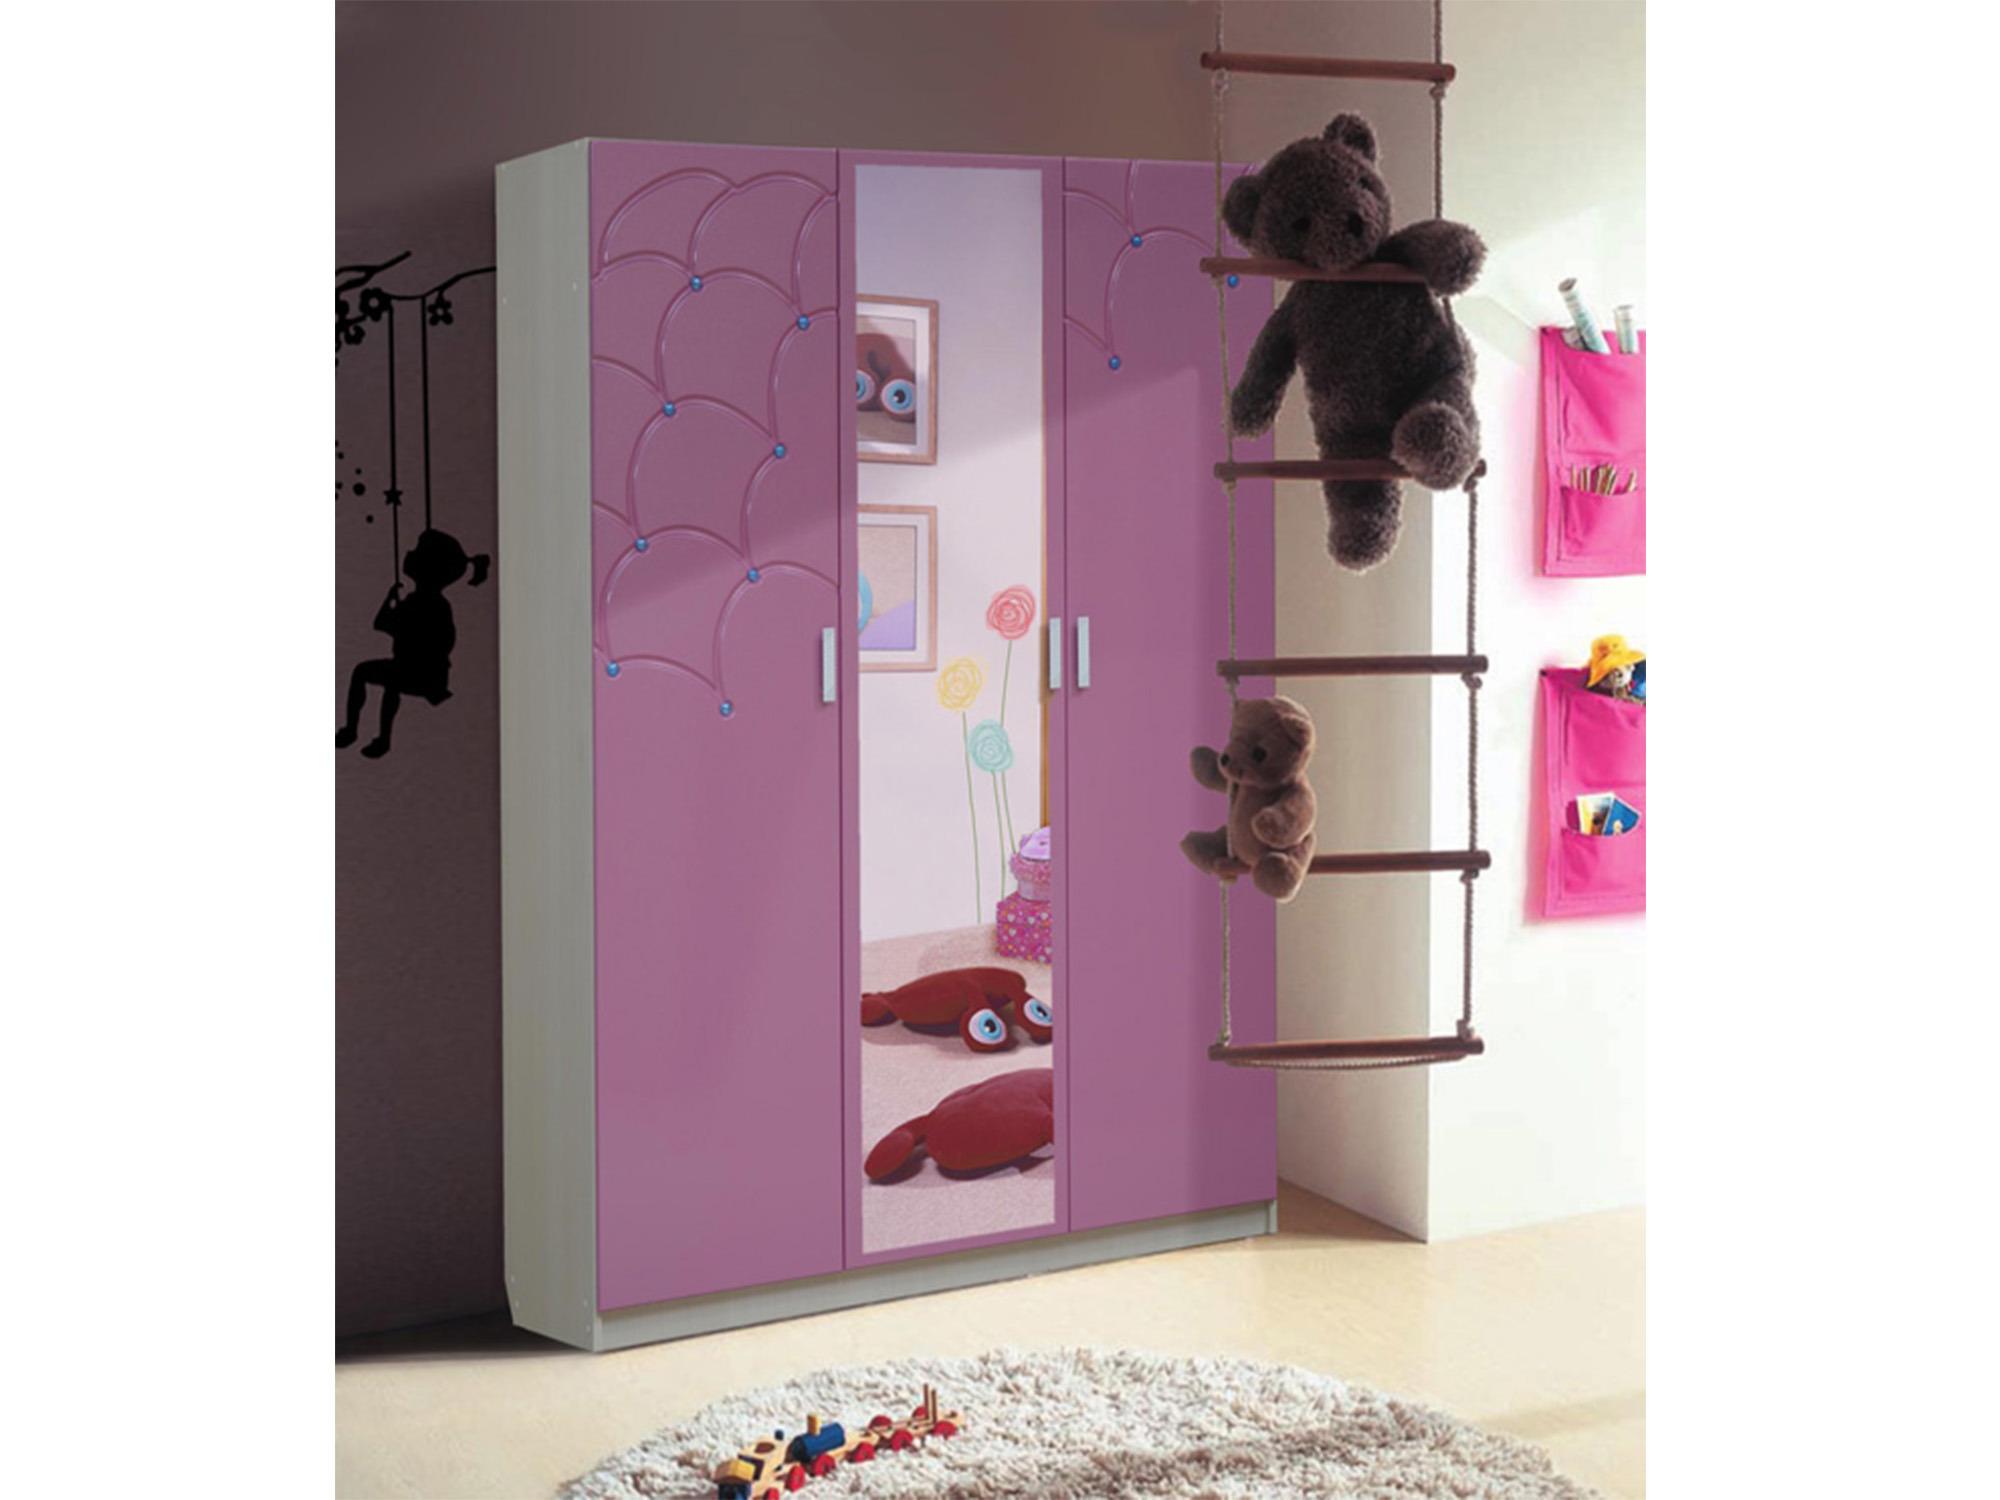 Шкаф с зеркалом МальвинаДетская<br><br><br>Длина мм: 1500<br>Высота мм: 2100<br>Глубина мм: 520